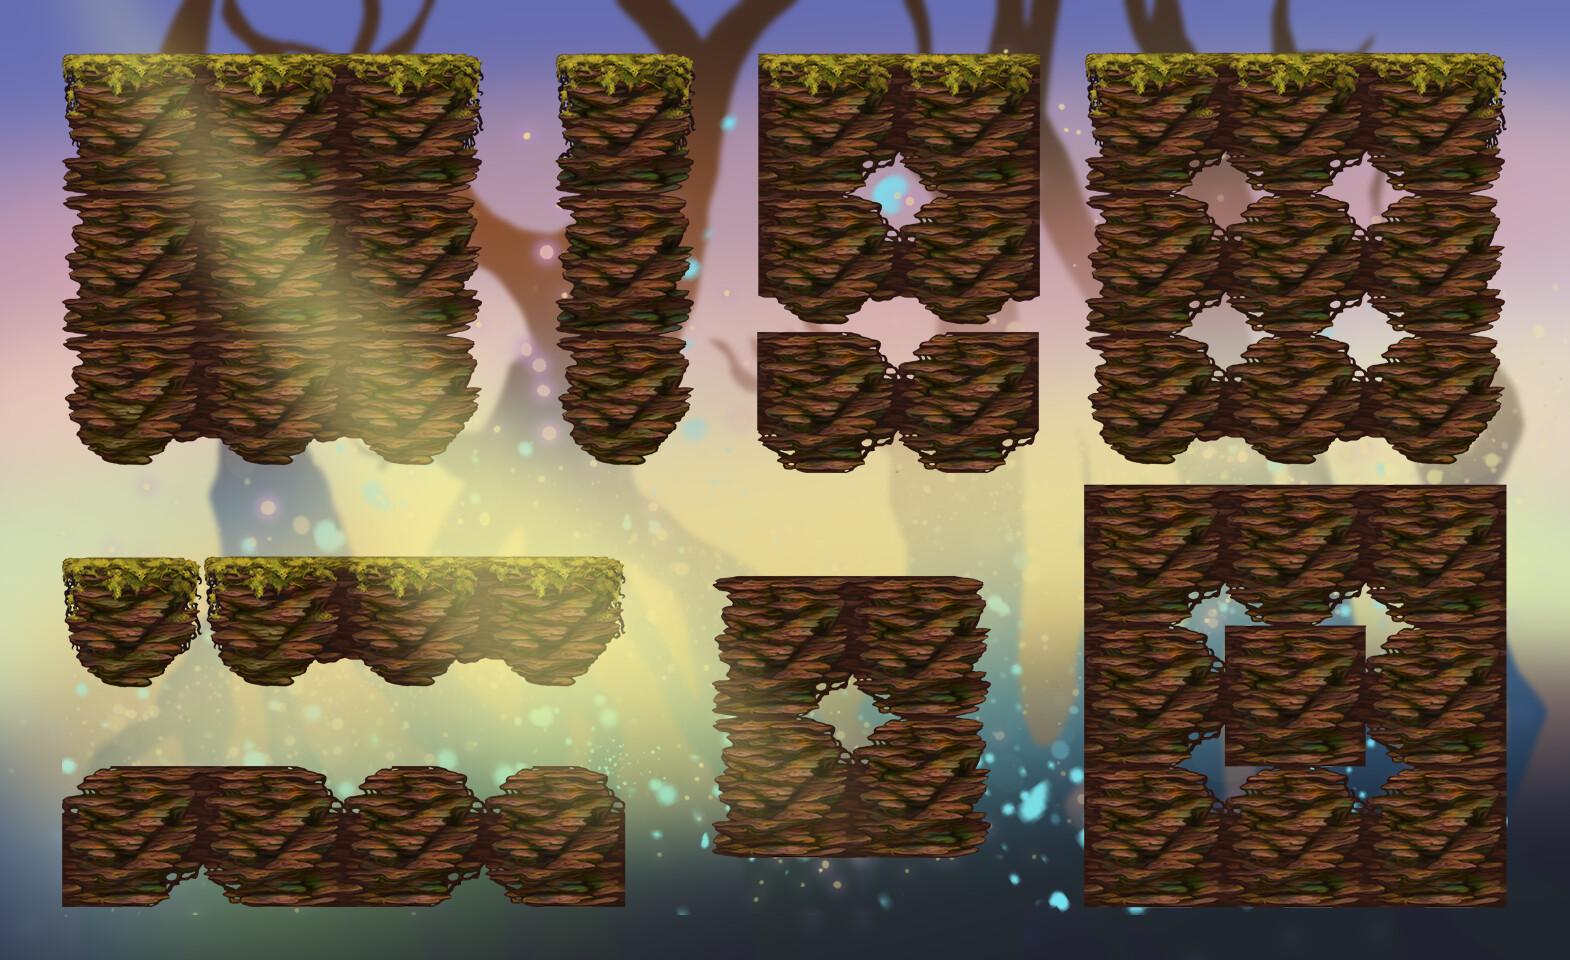 Moon tribe screenshot 3